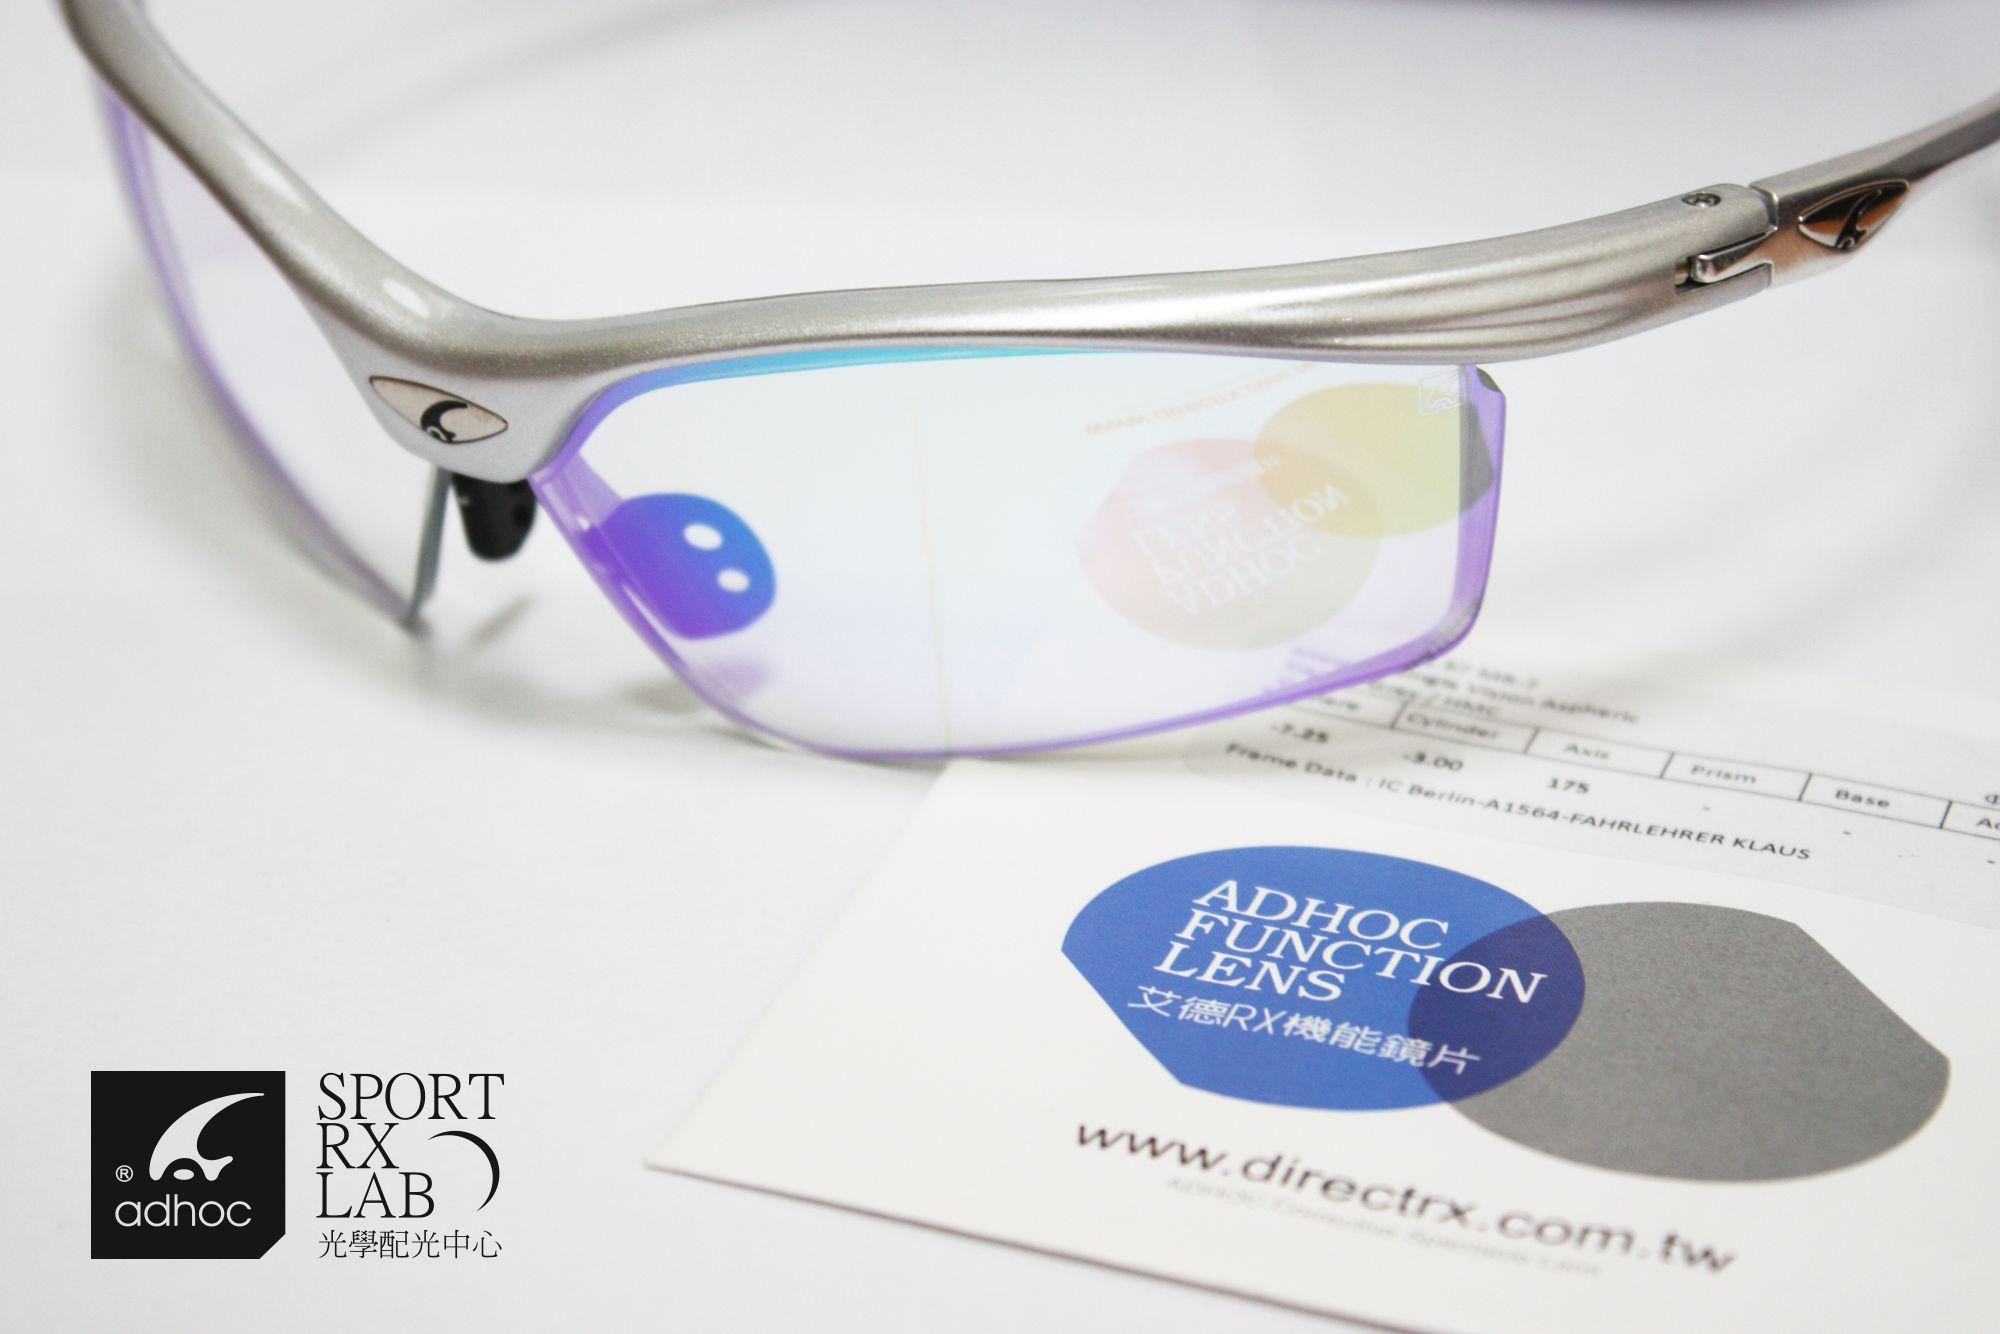 adhoc SPEEDOR sport eyewear with adhoc RX optic